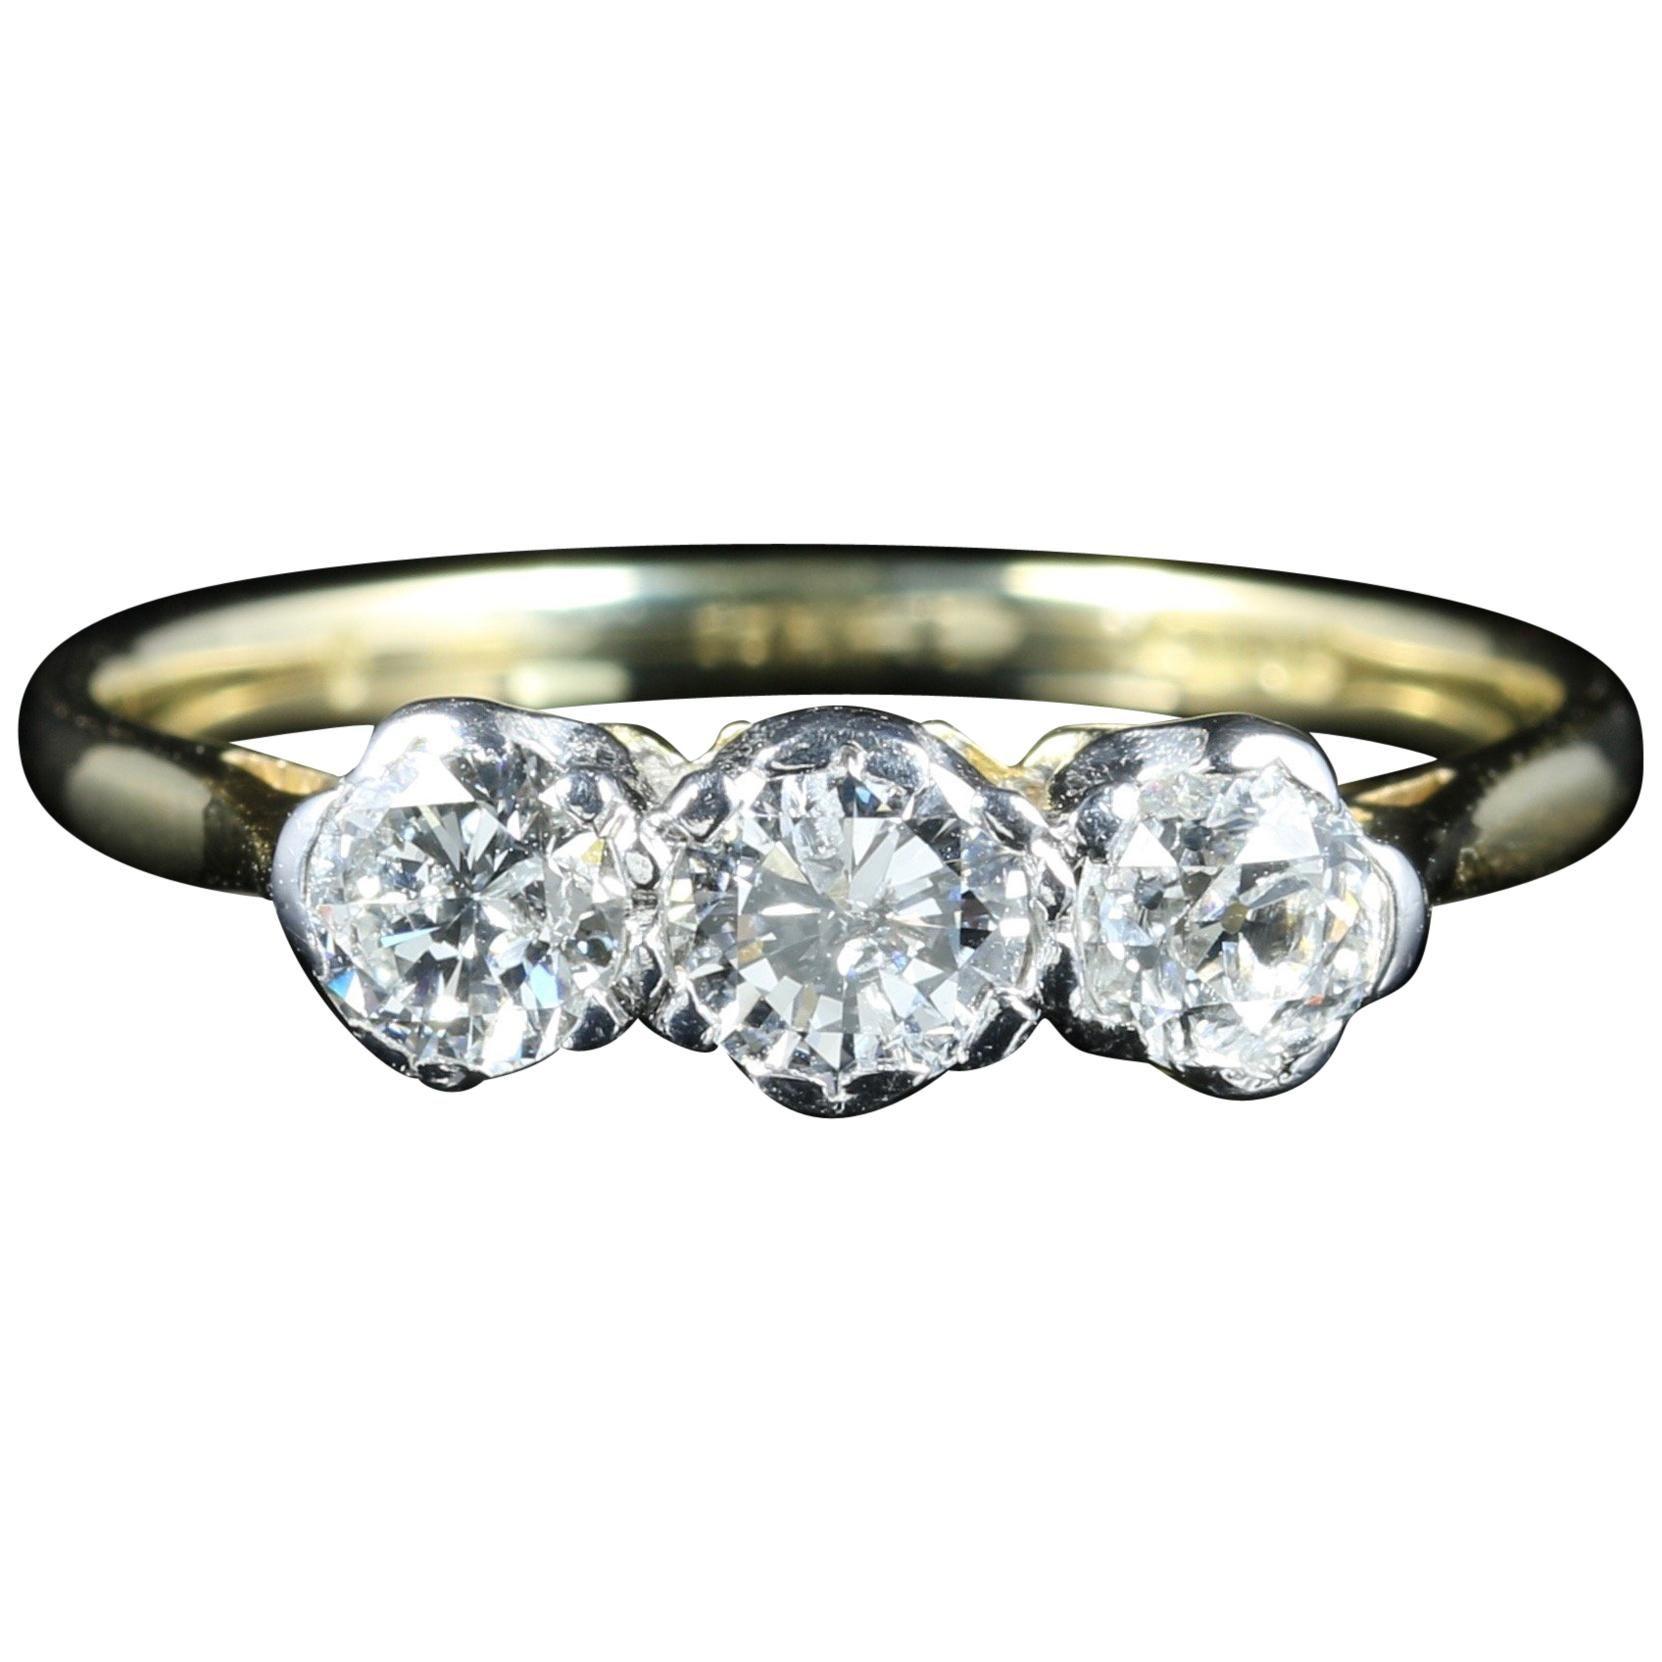 Antique Edwardian Diamond Trilogy Ring Circa 1915 Gold Plat For Sale At 1stdibs: Genuine Edwardian Wedding Rings At Websimilar.org